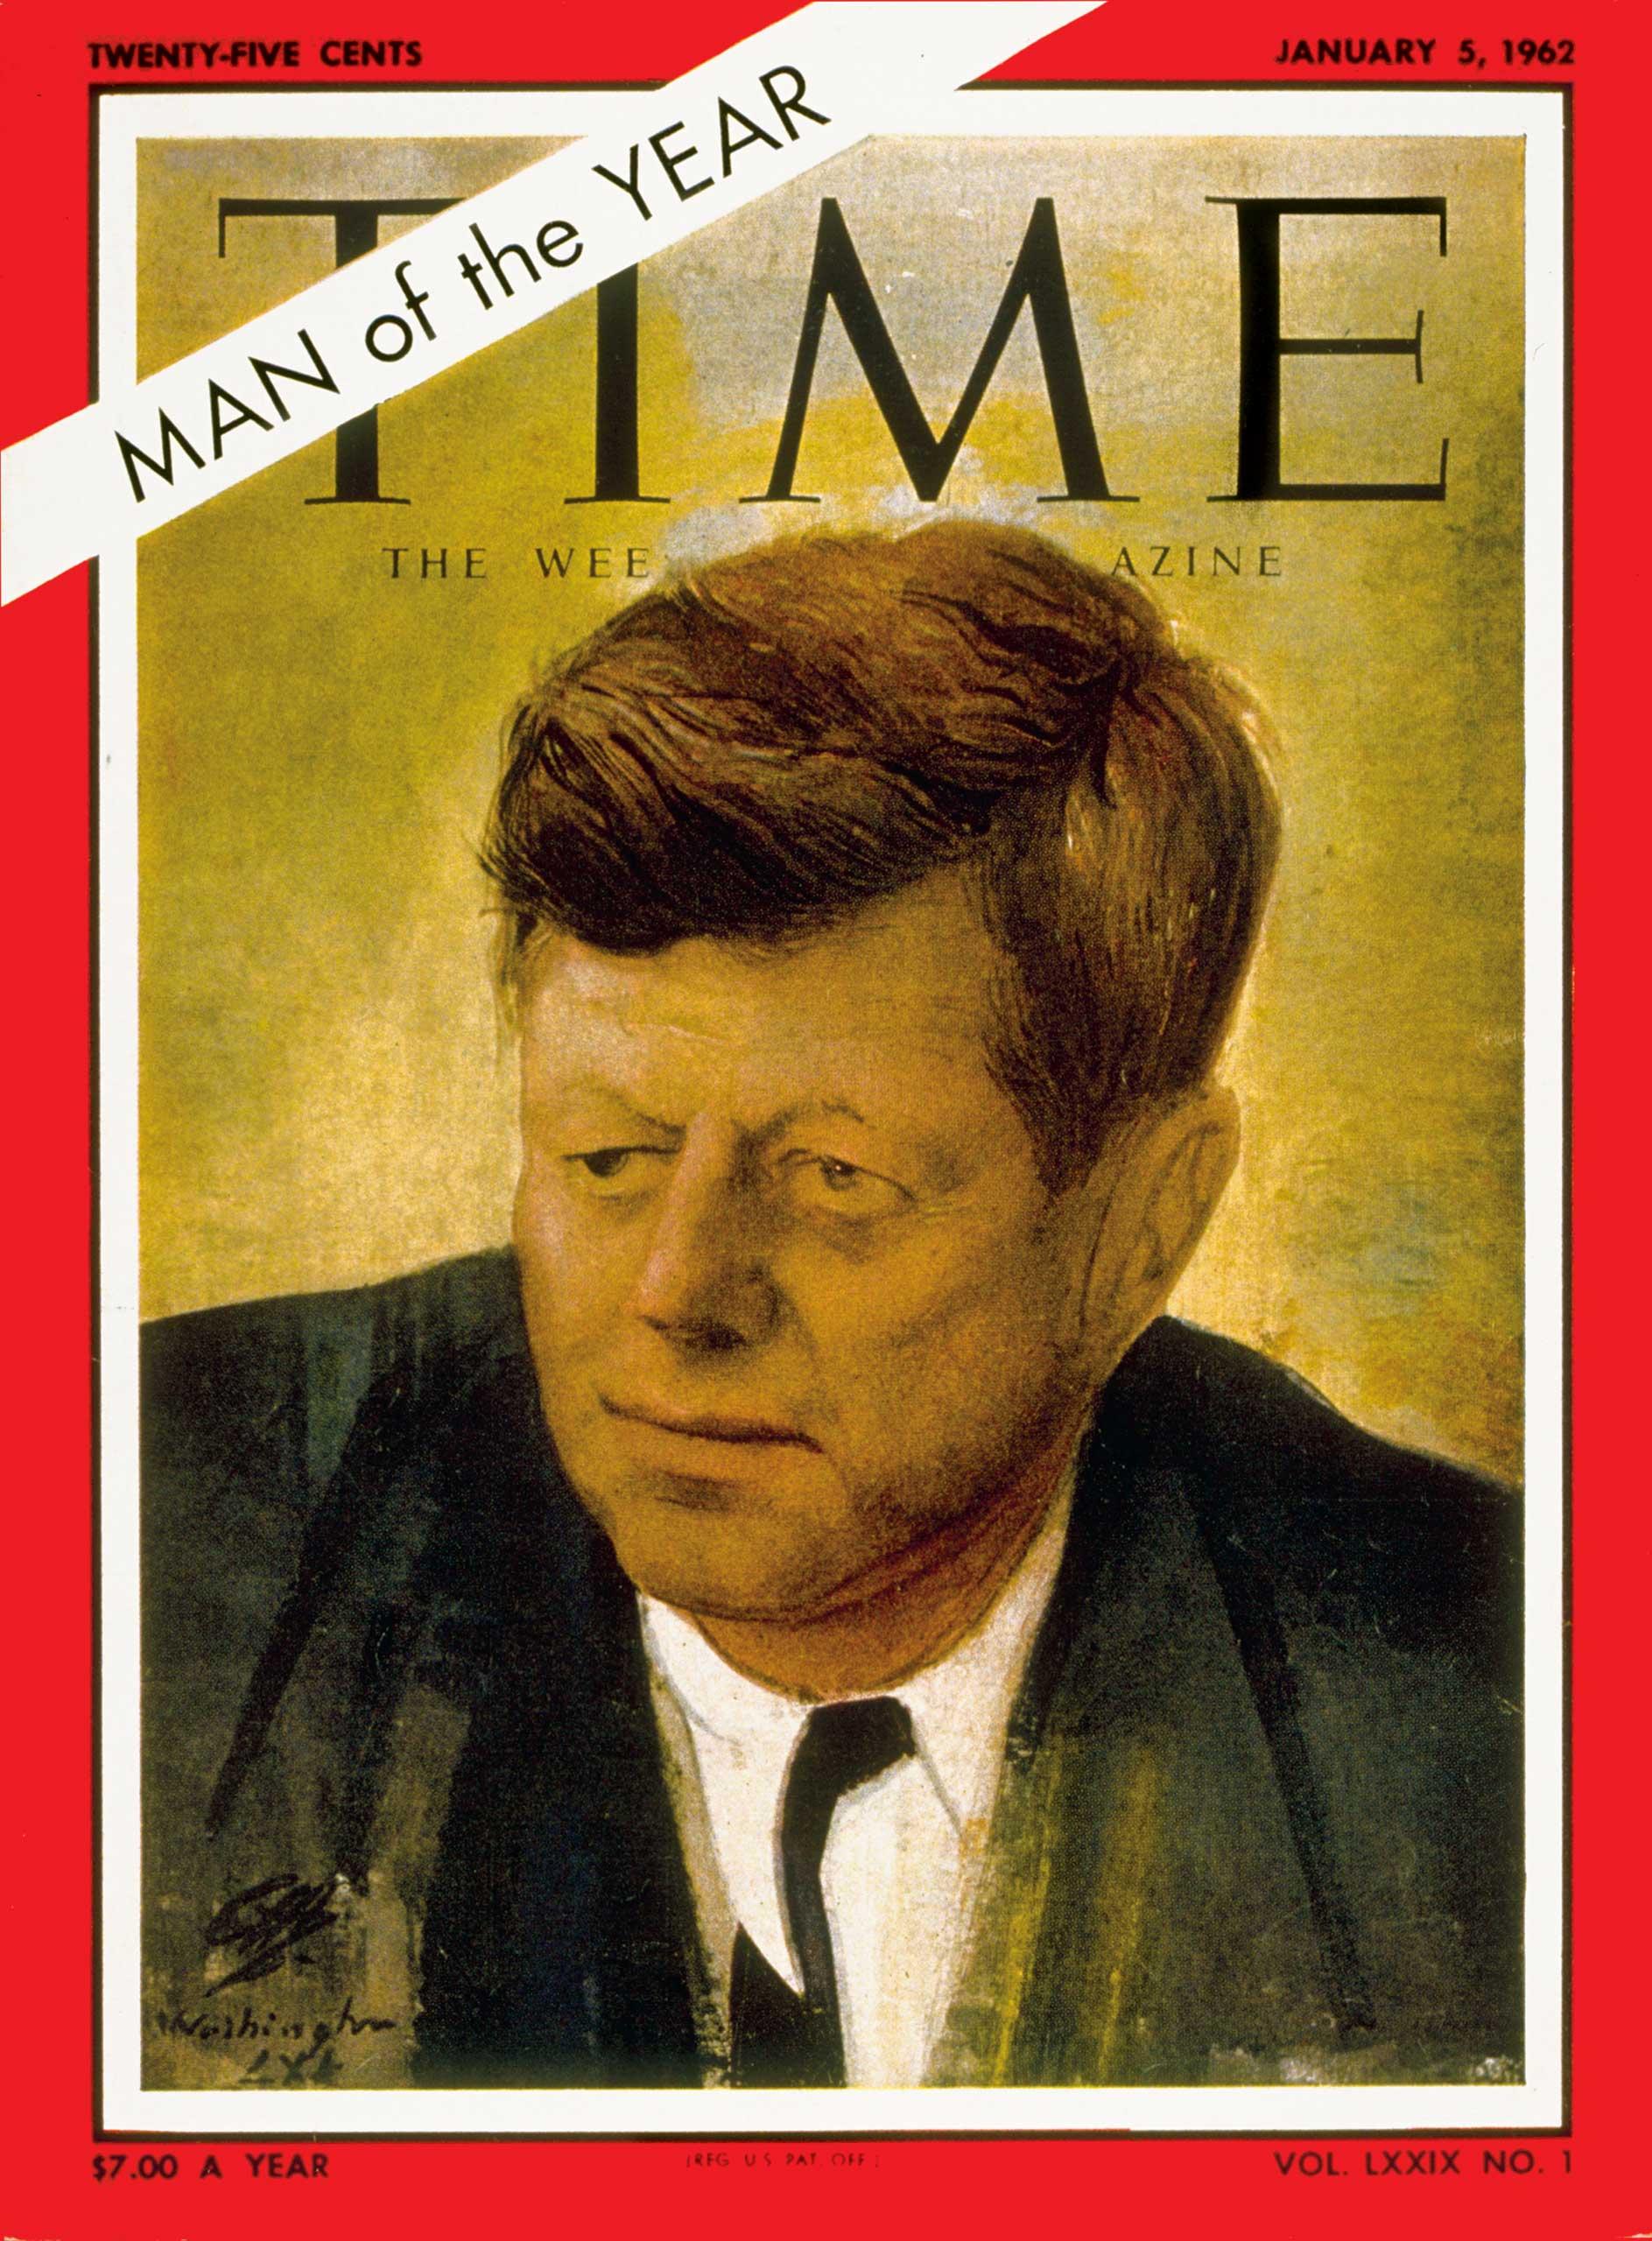 1961: President John F. Kennedy